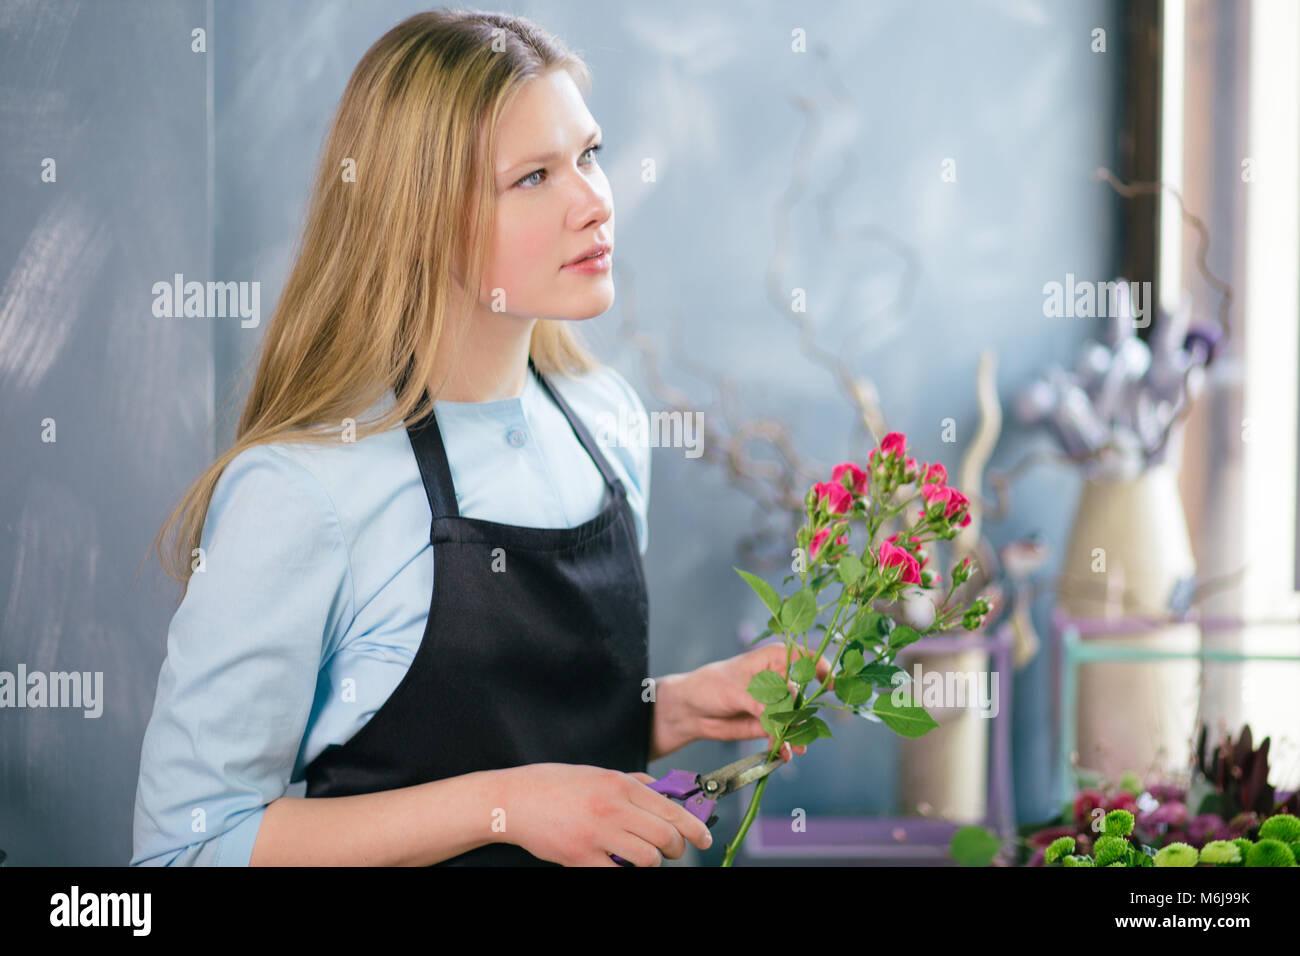 florist thinking about arranging flowers, making up floral wonderland - Stock Image